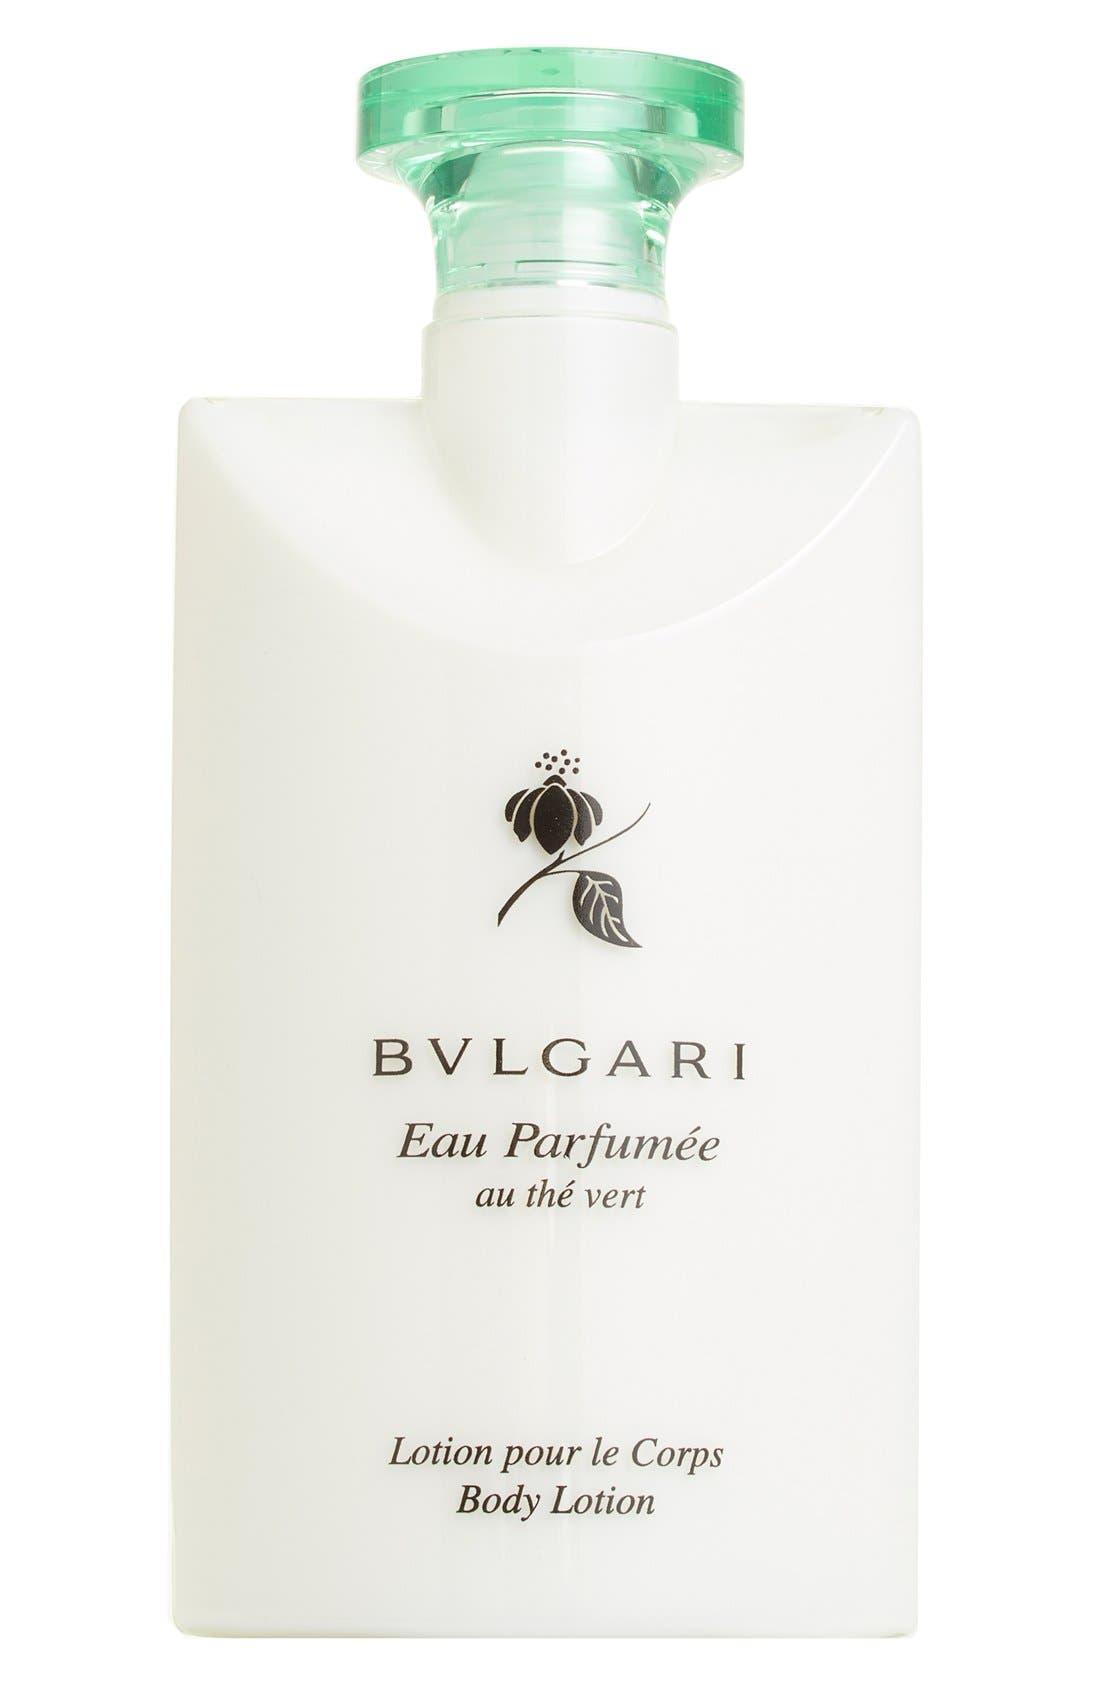 BVLGARI 'Eau Parfumée au thé Vert' Body Lotion